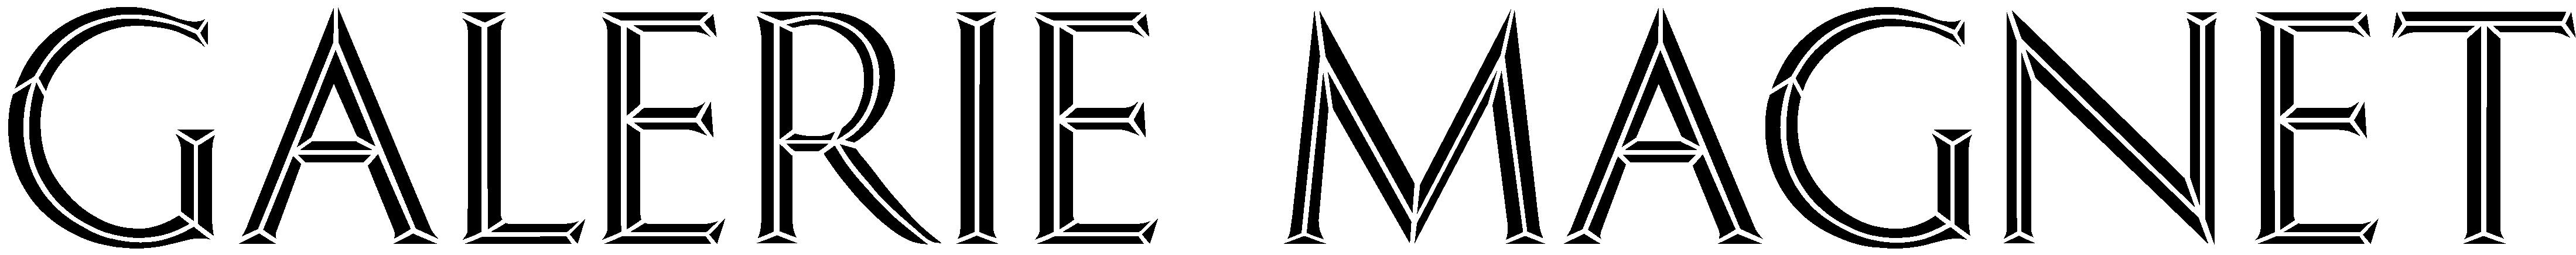 Galerie Magnet logo transparent